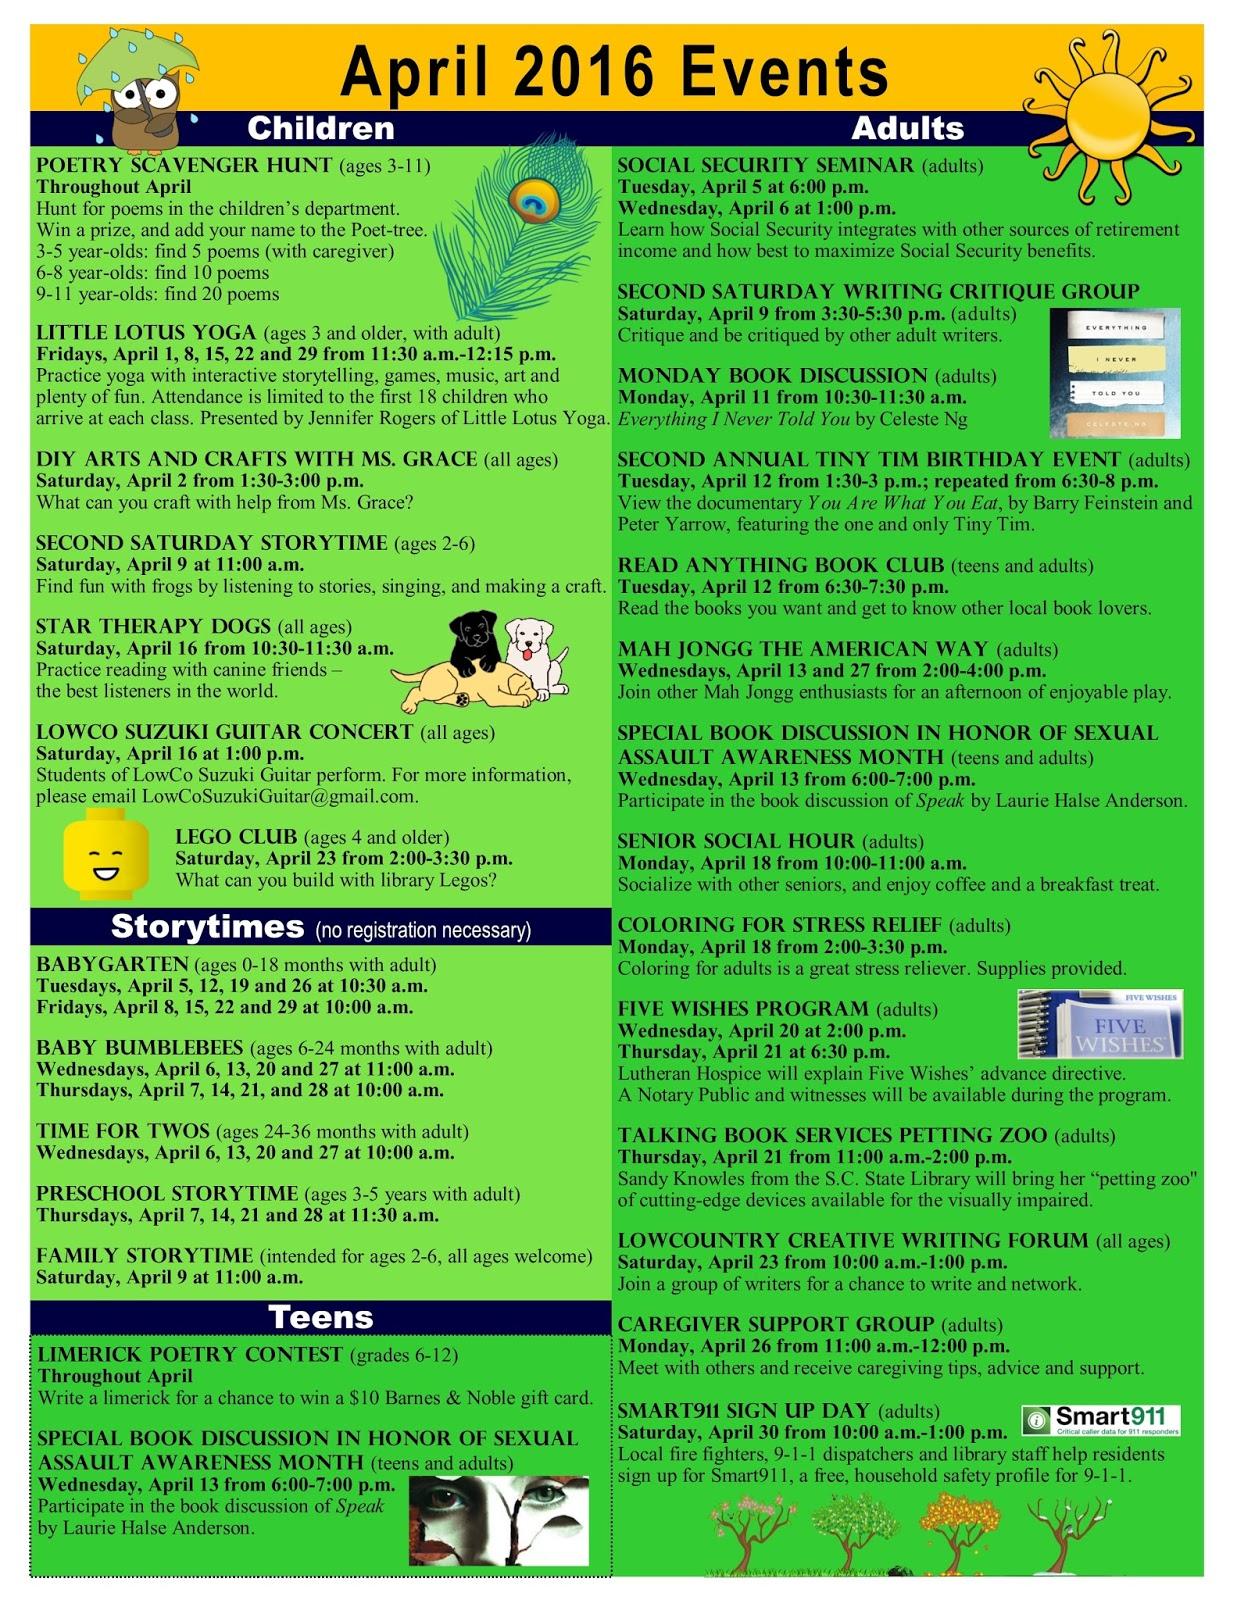 small resolution of aramco operational calendar 2014 auto electrical wiring diagram rh wiring diagram edu fr keldean co uk